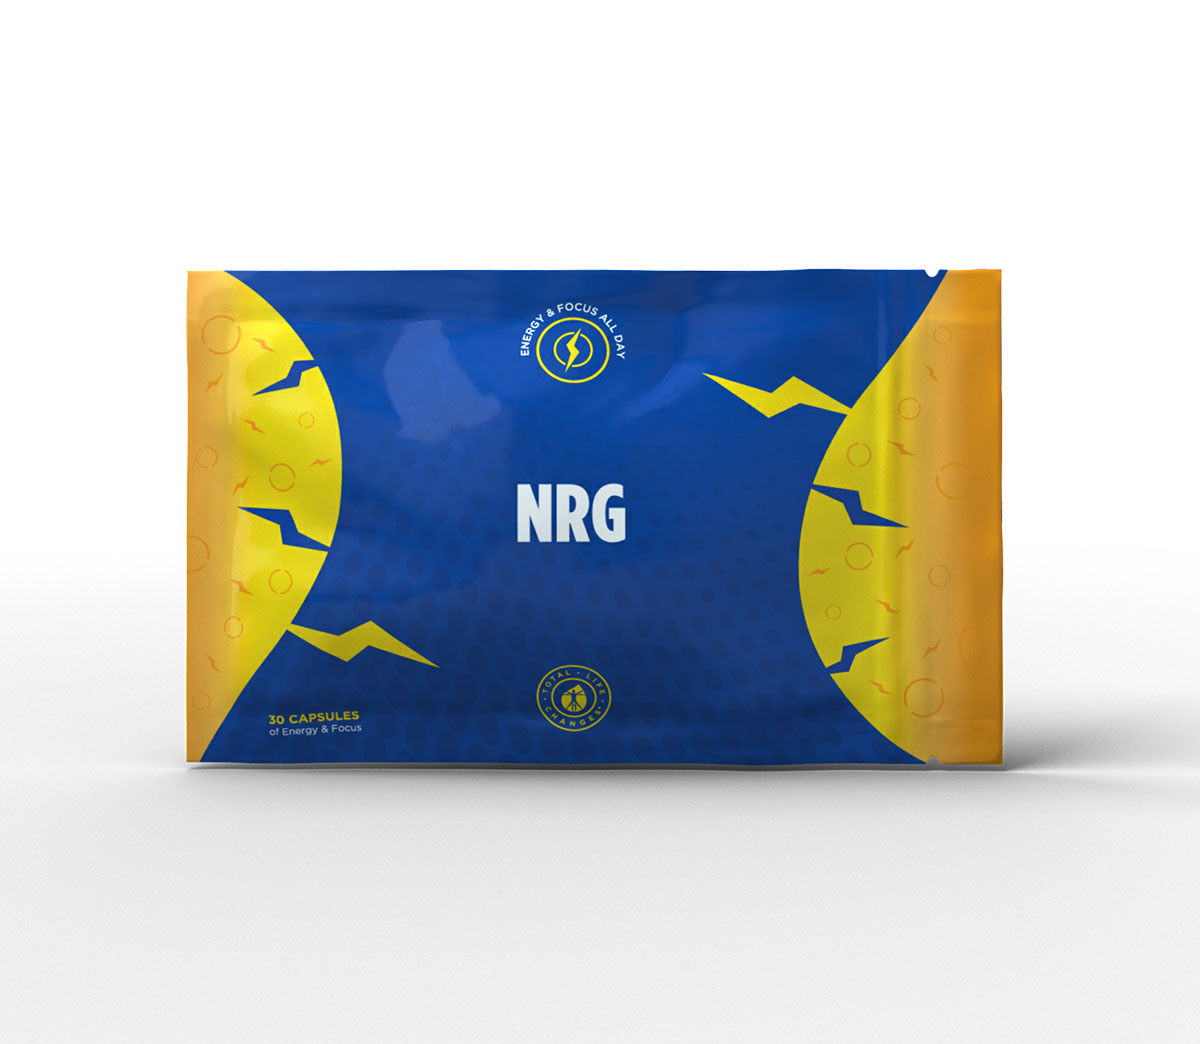 NRG - $54.95 USD